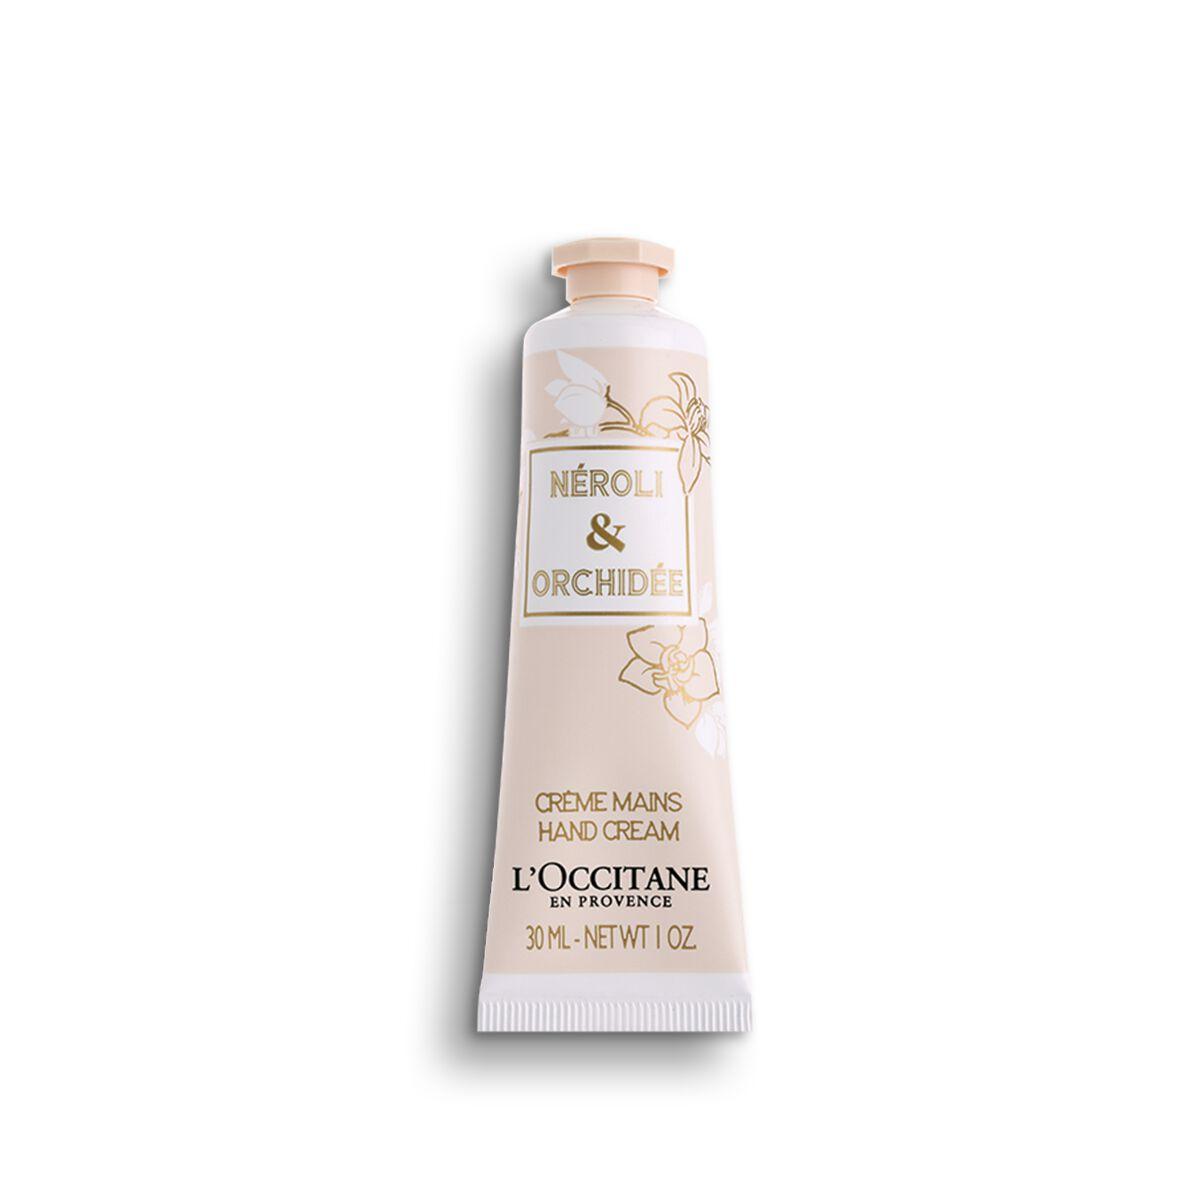 Néroli & Orchidée Hand Cream 1 oz.